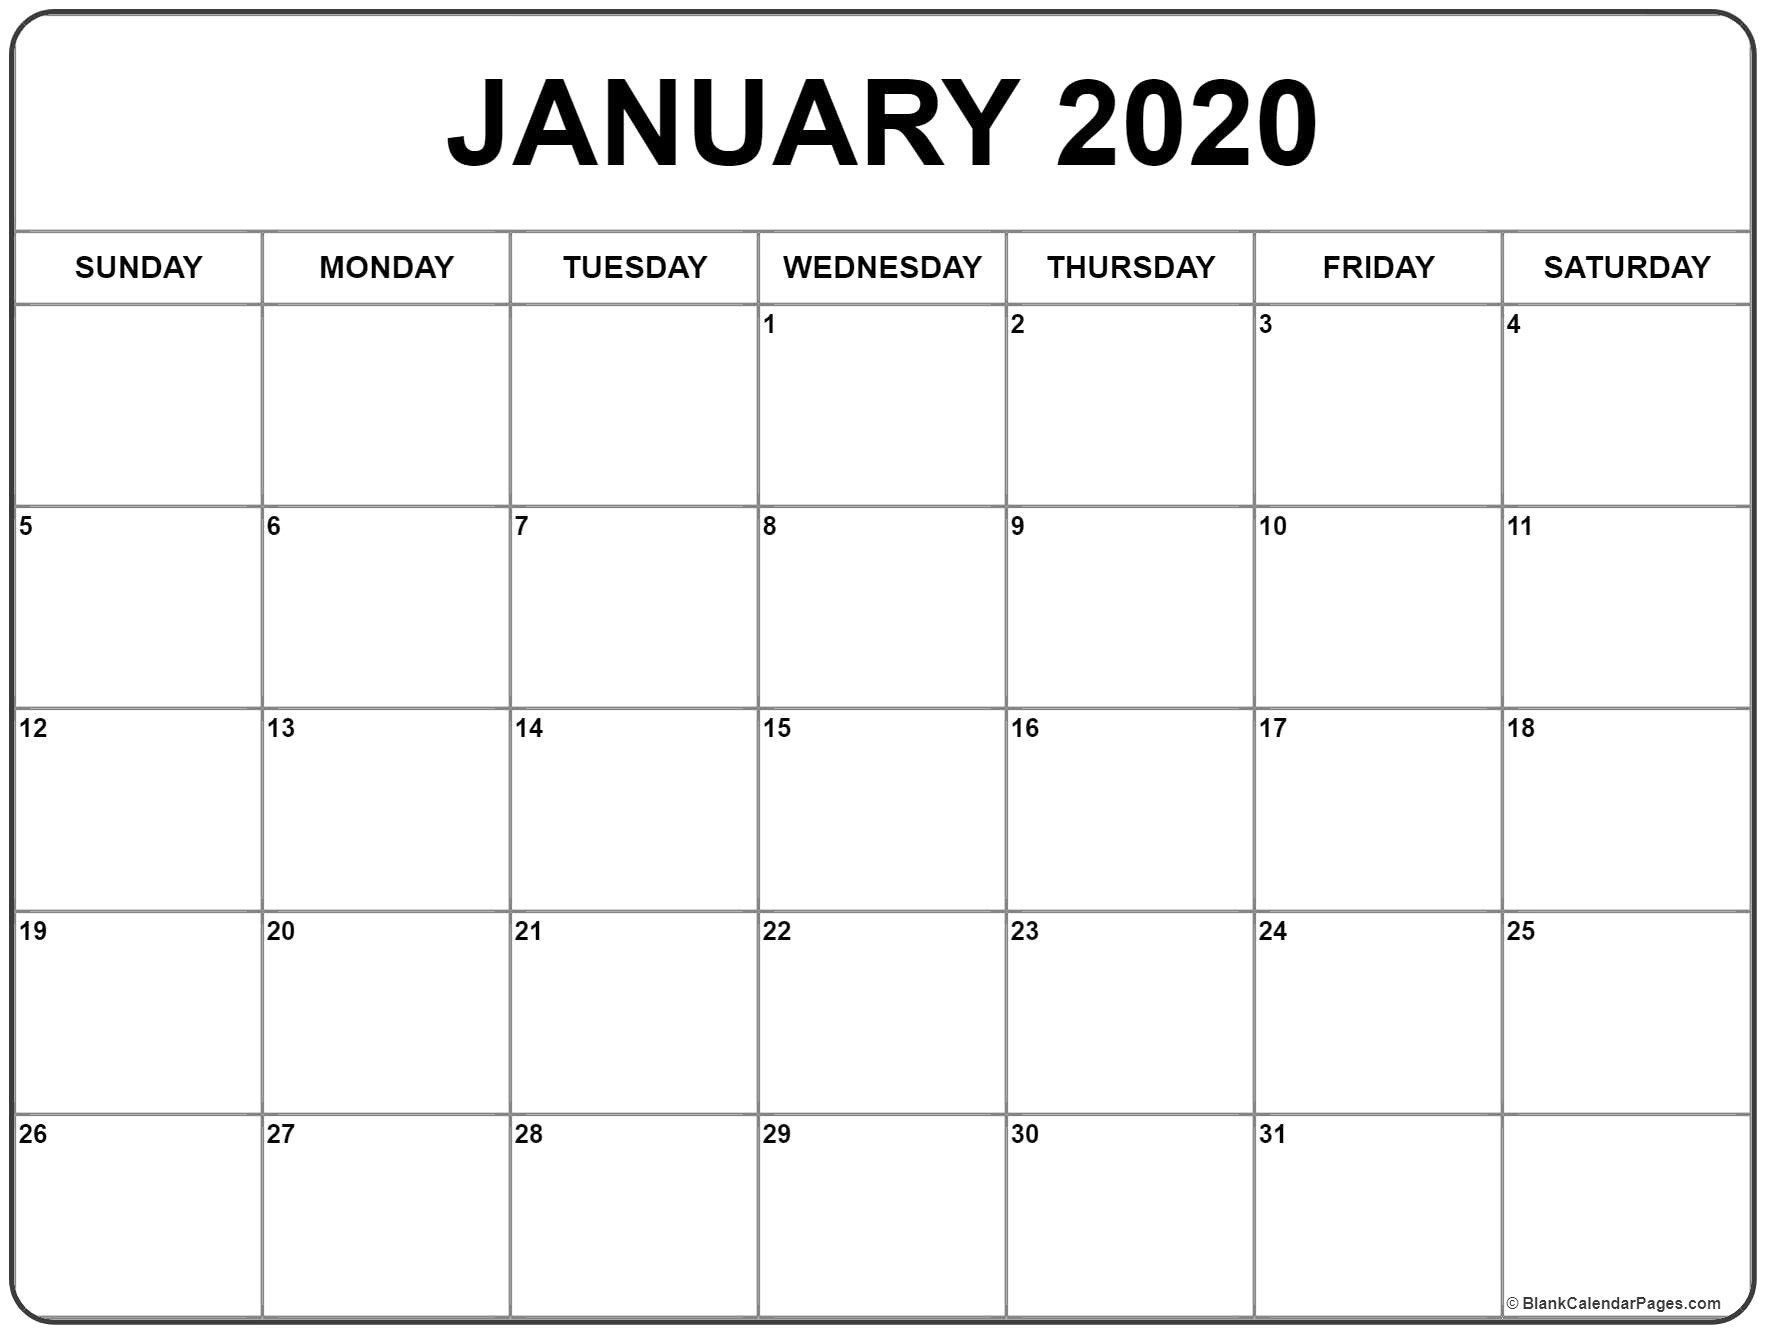 January 2020 Calendar B2 | Jcreview-Moon Calendar January 2020